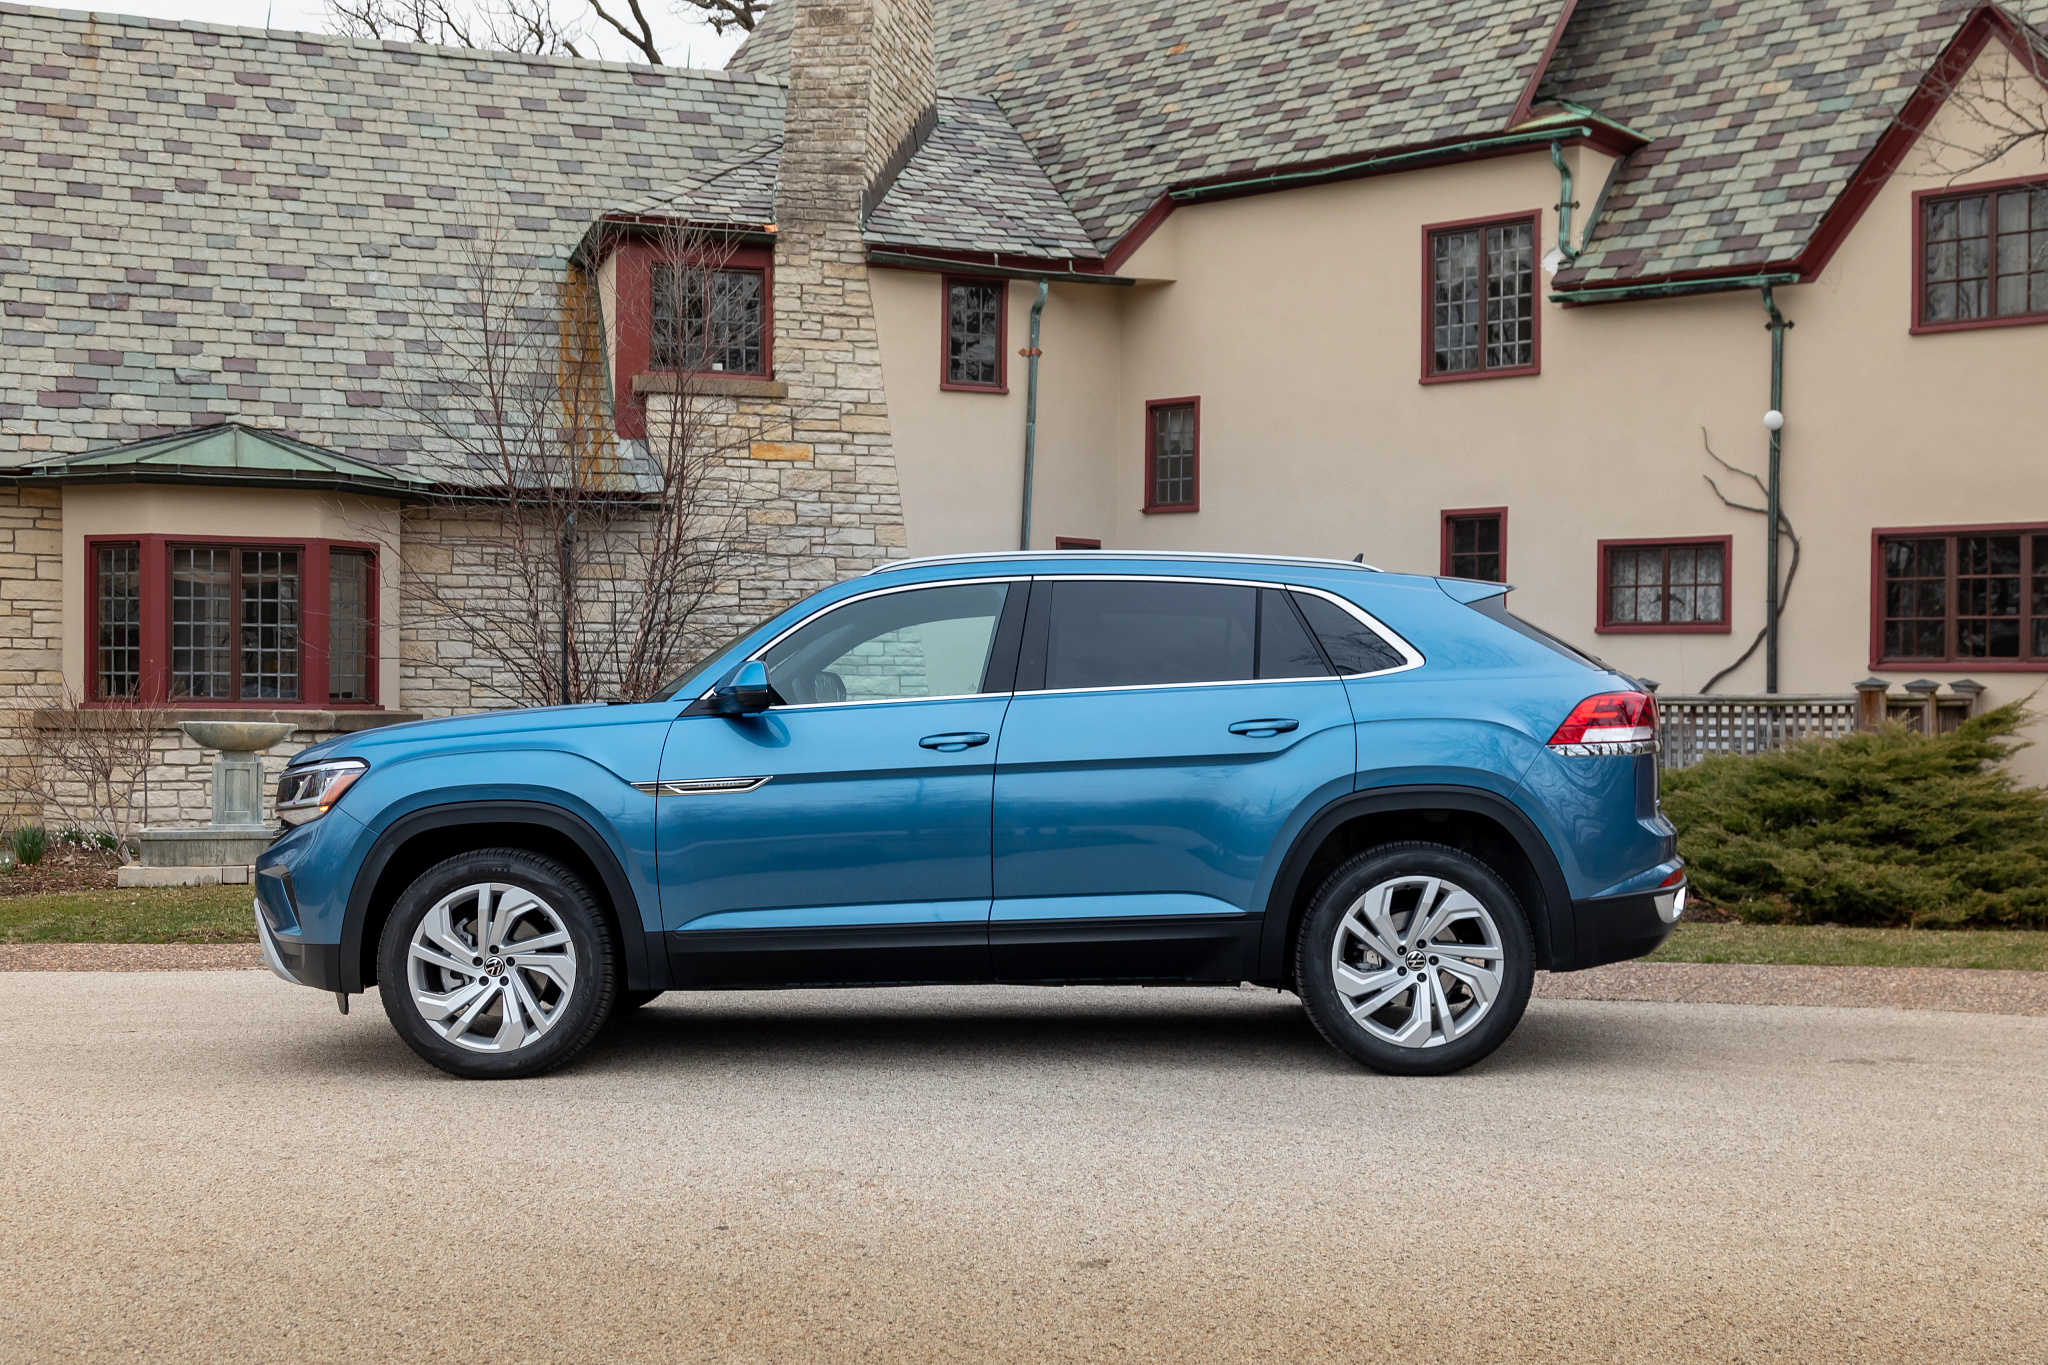 volkswagen-atlas-cross-sport-2020-03-blue--exterior--profile.jpg